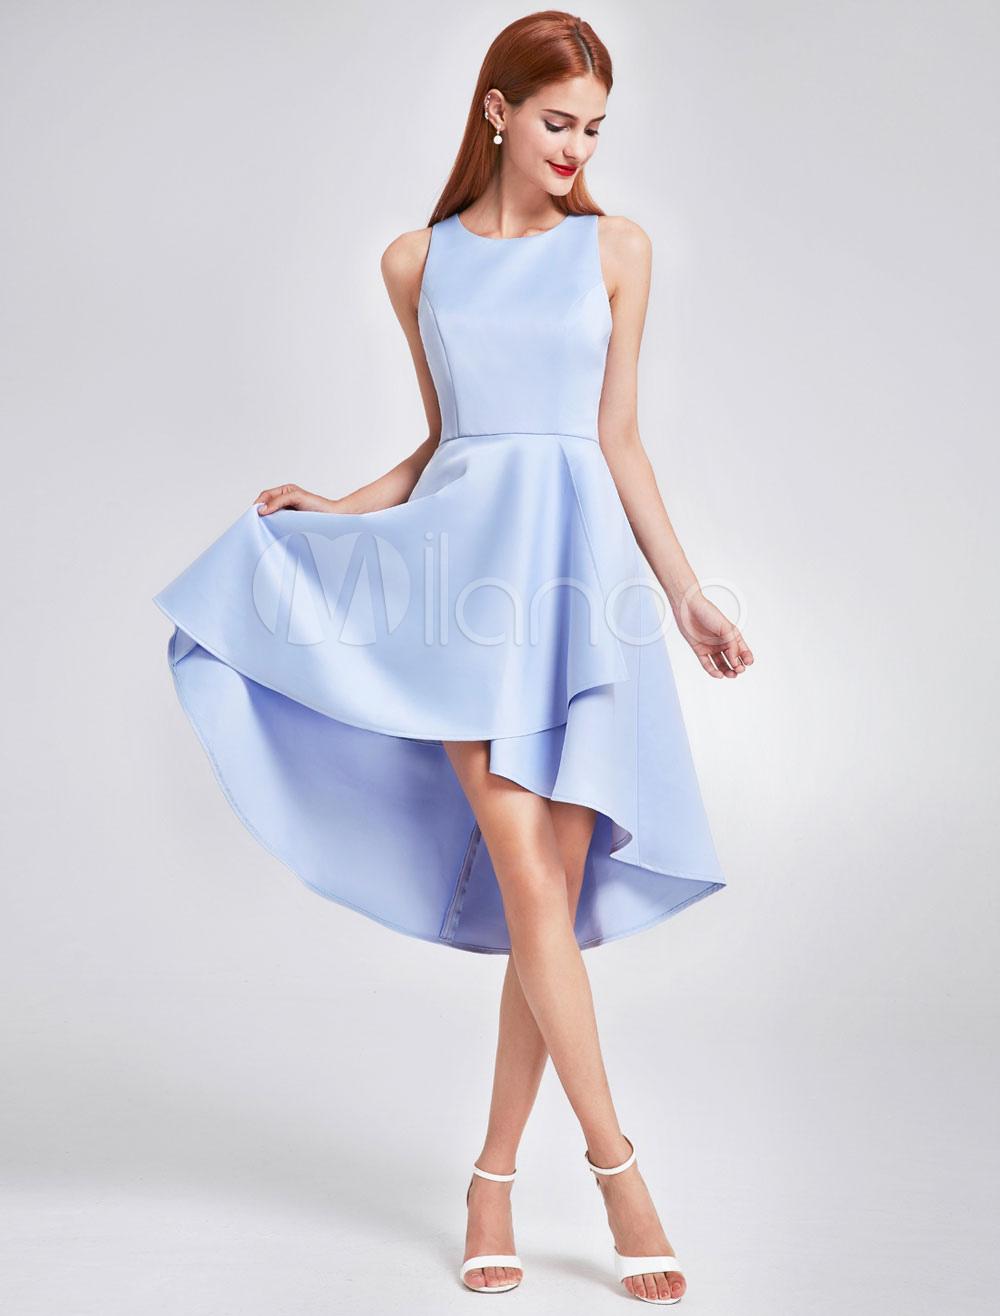 Short Bridesmaid Dresses Satin Baby Blue High Low Sleeveless Knee Length Wedding Party Dress photo